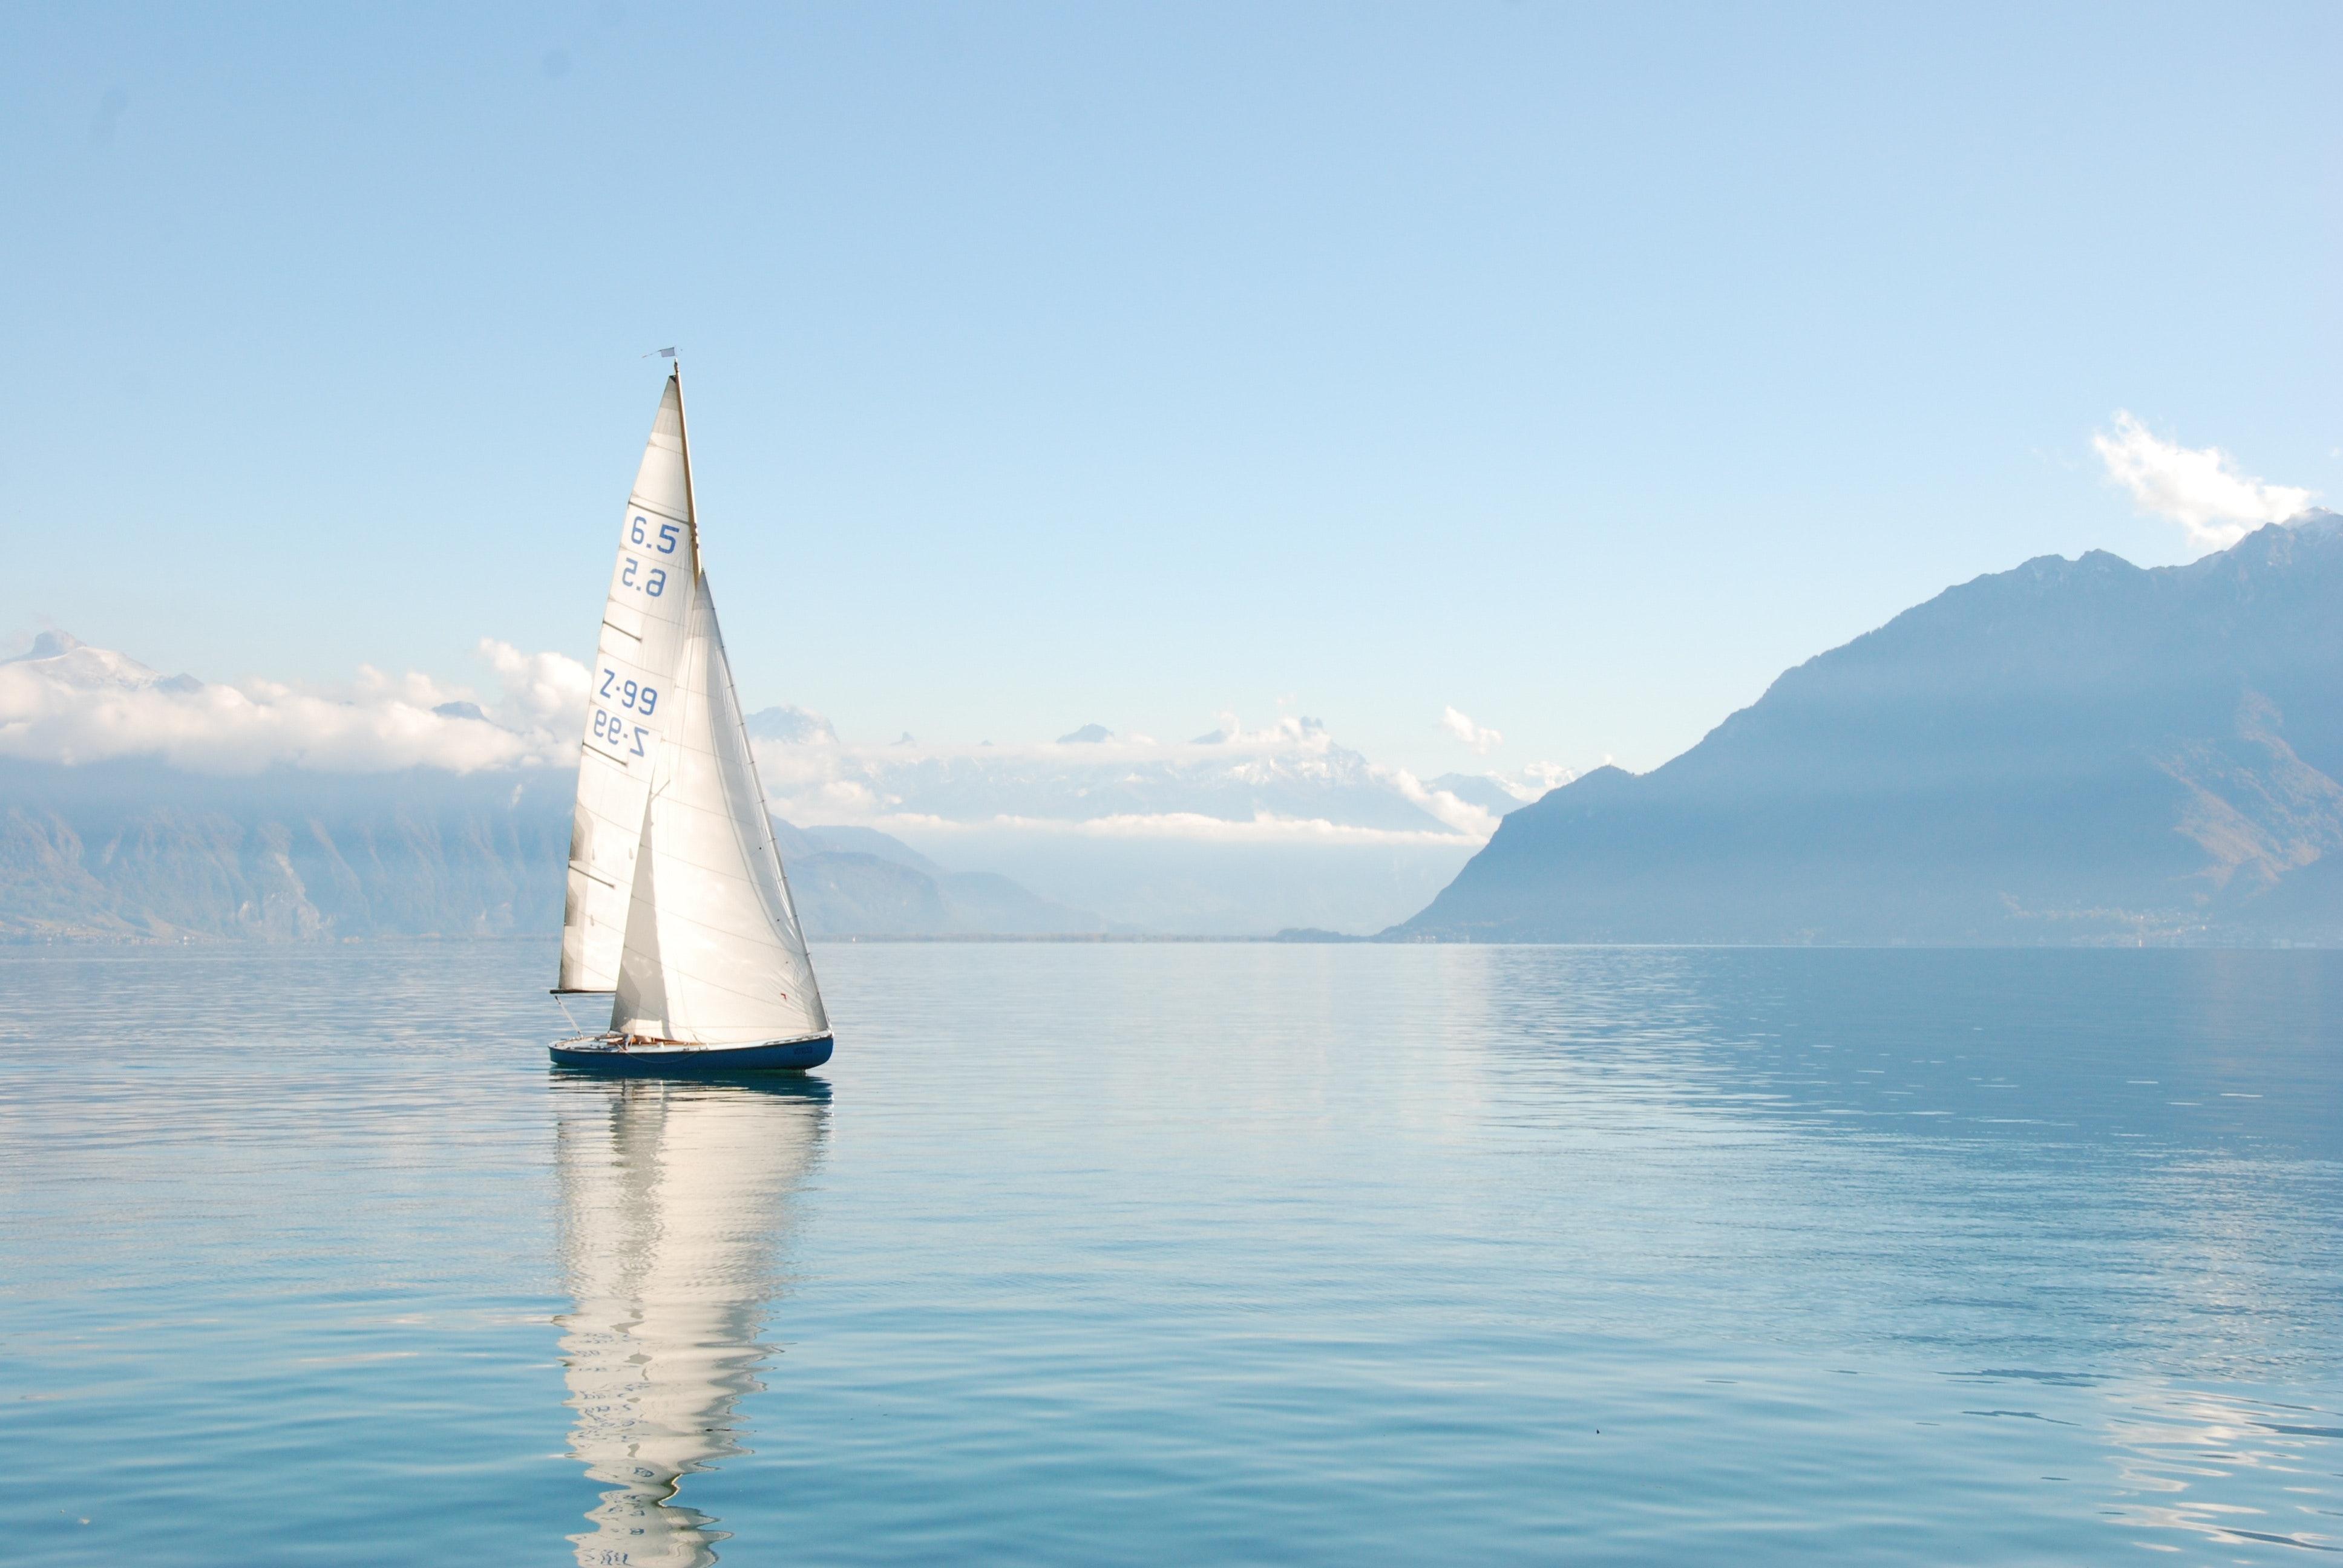 Related Searches Ship Yacht Sea Ocean Beach